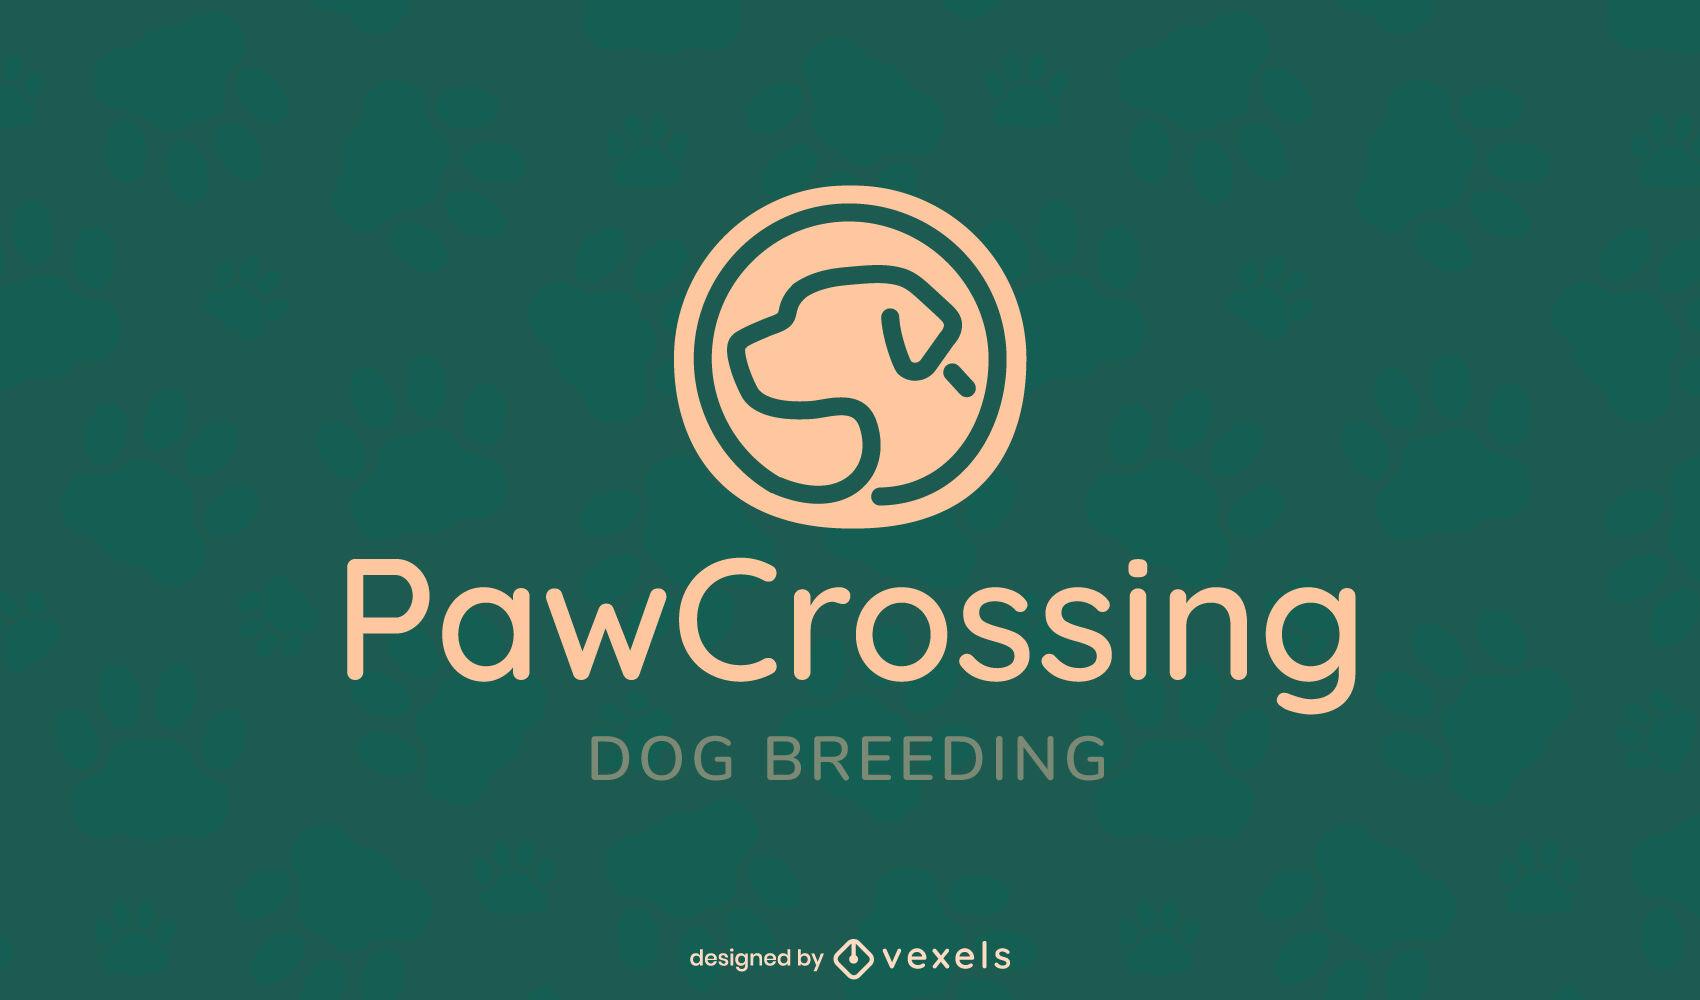 Dog breeding logo template